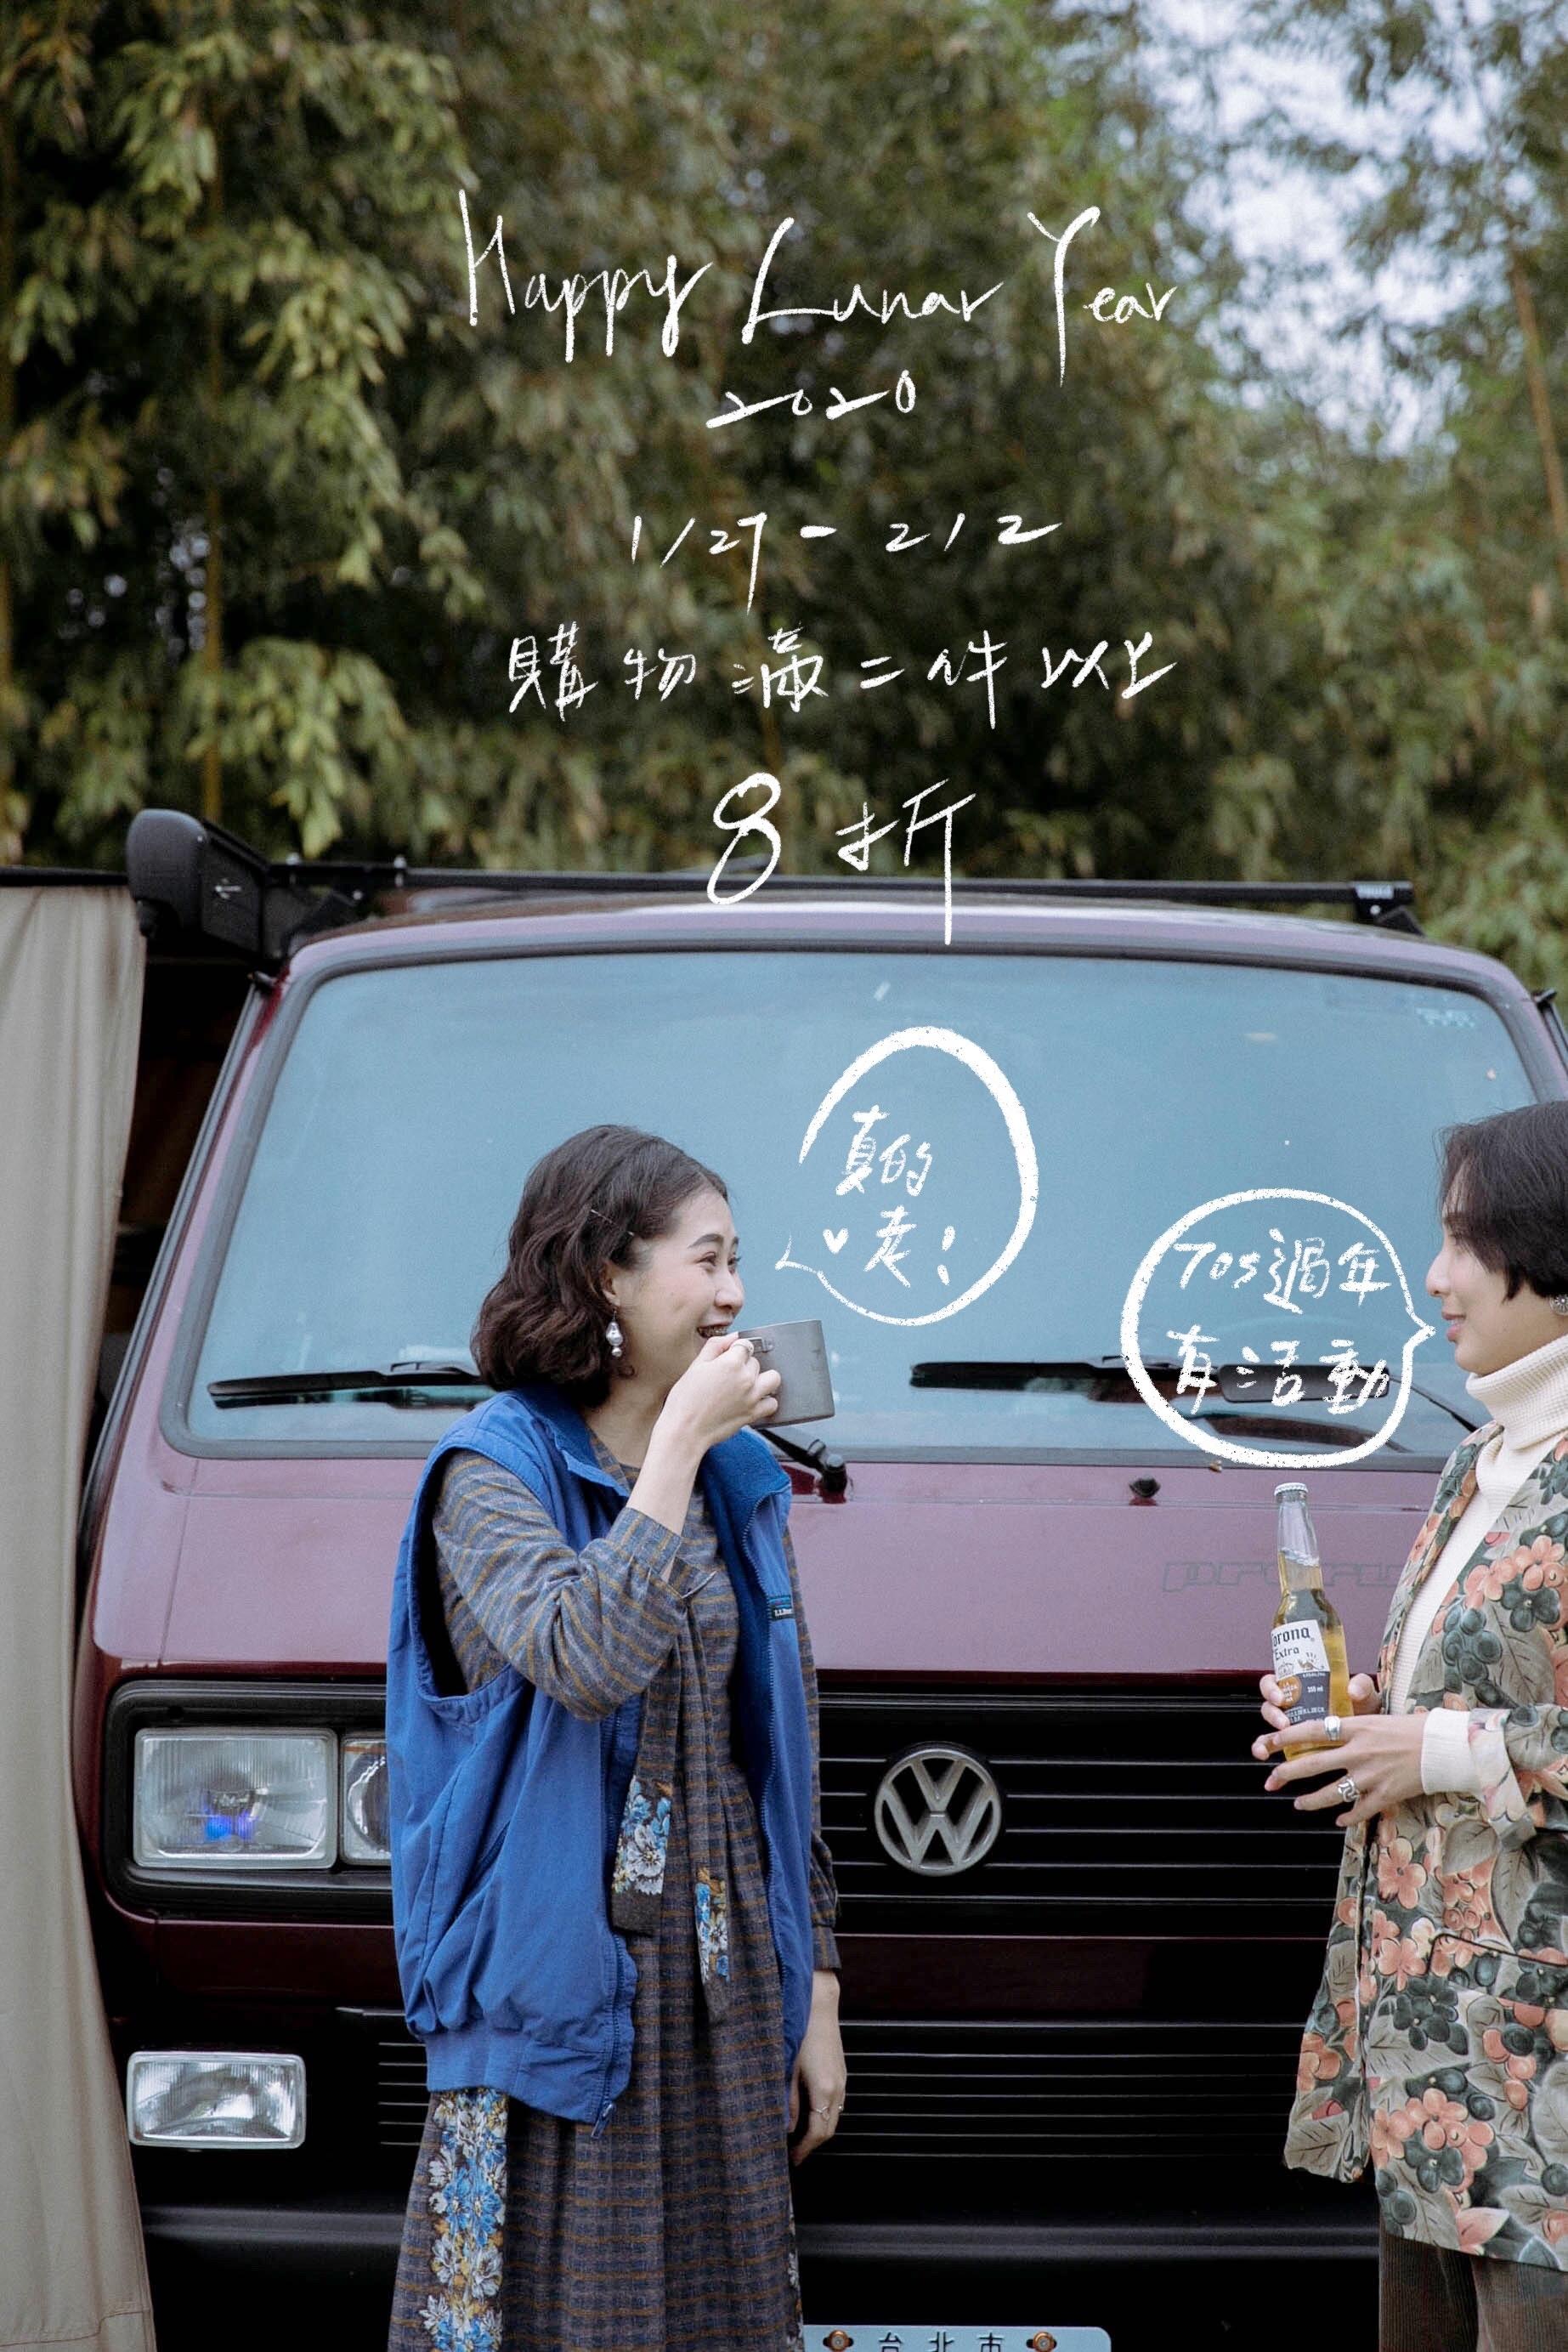 "<img src=""70s-vintage-clothing-折扣活動8折.jpeg"" alt=""70s-vintage-clothing-折扣活動8折"">"